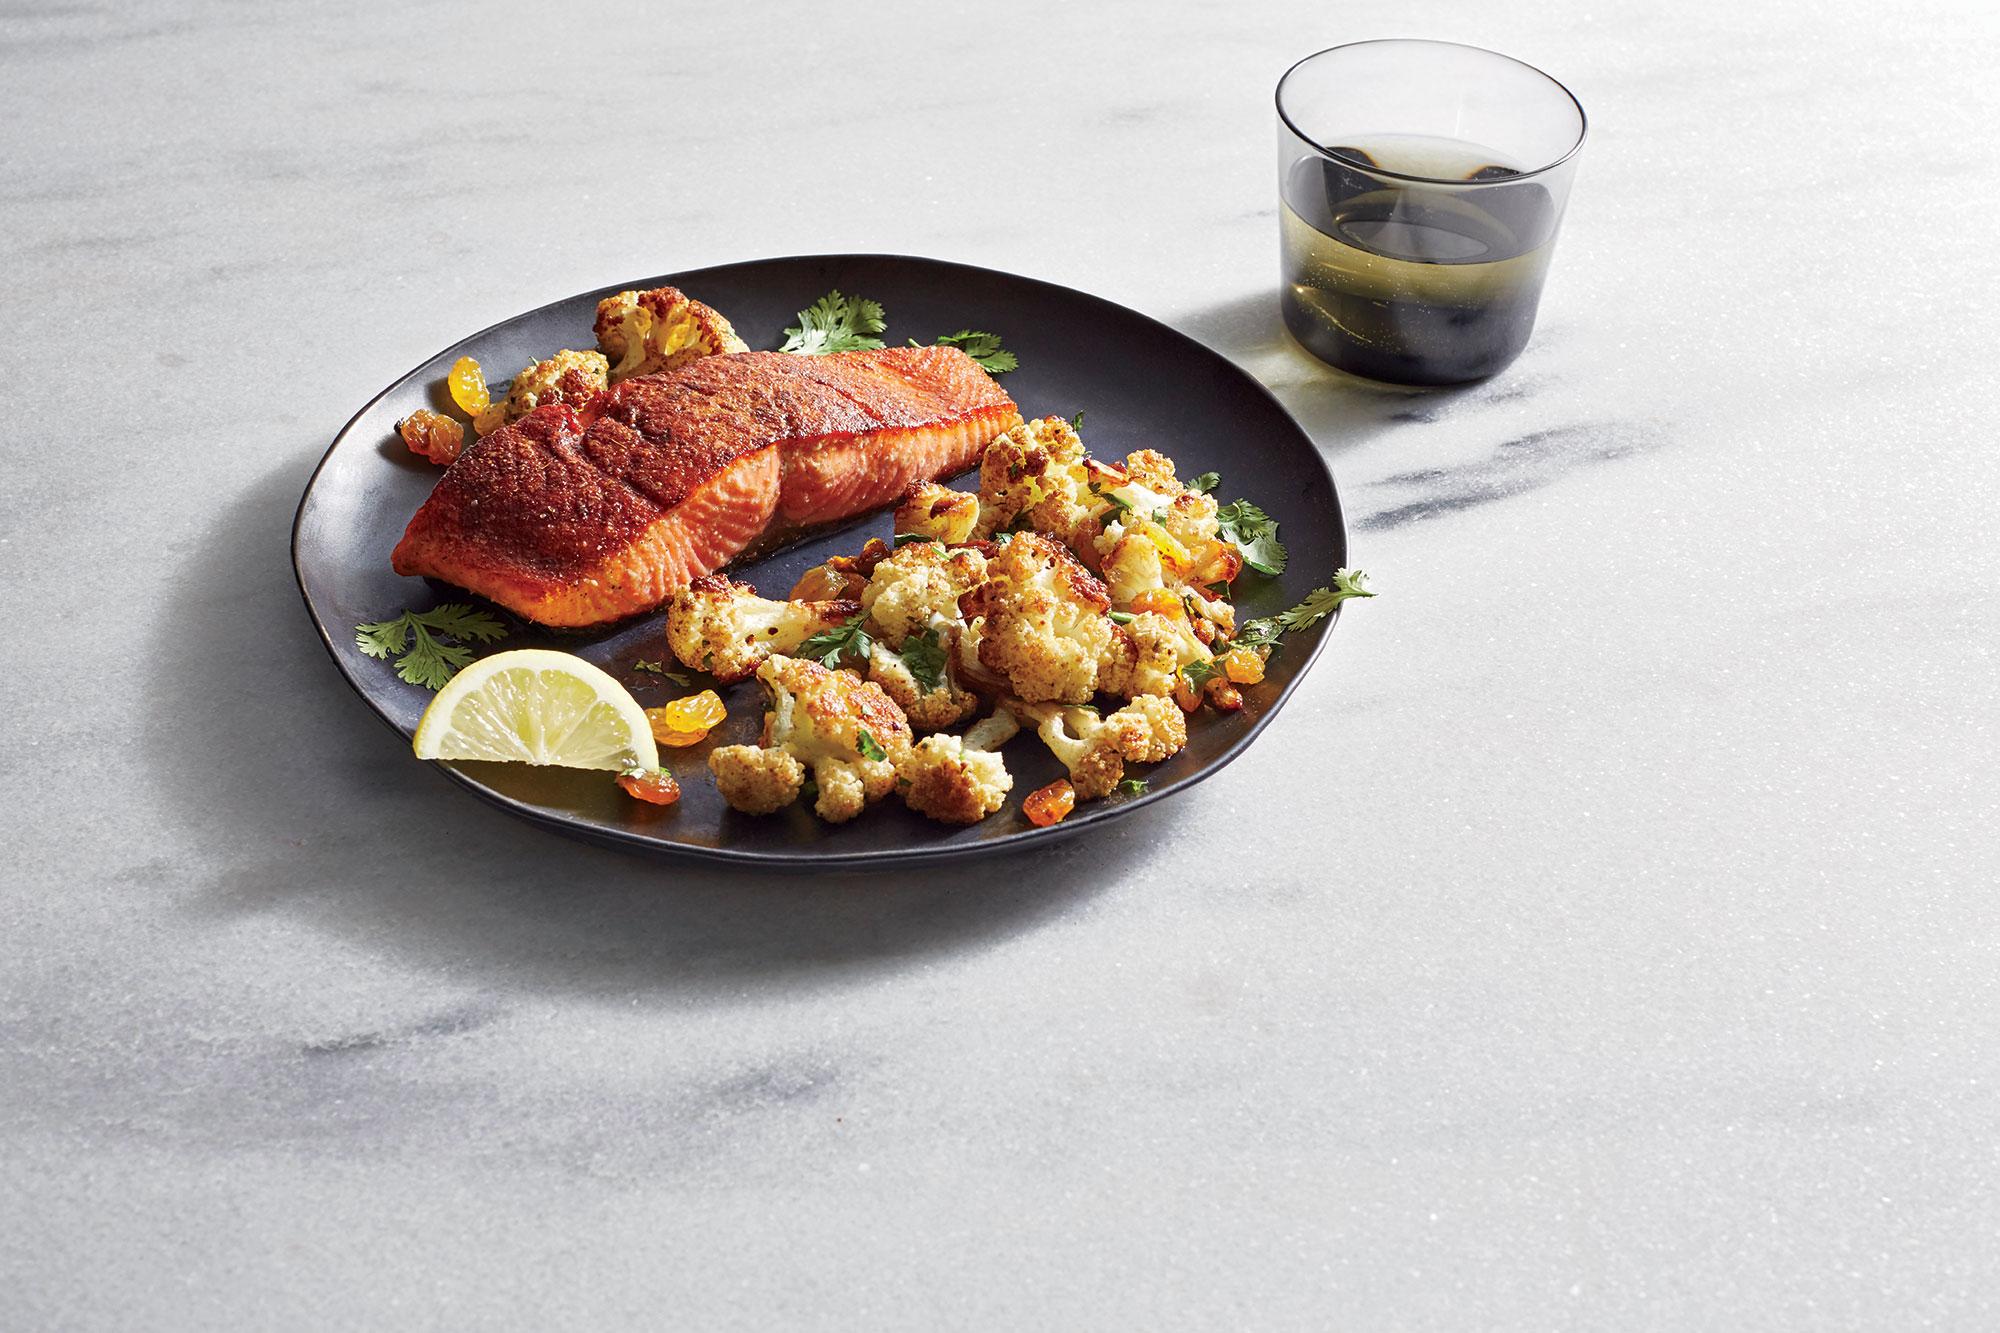 spice-roasted-salmon-with-roasted-cauliflower